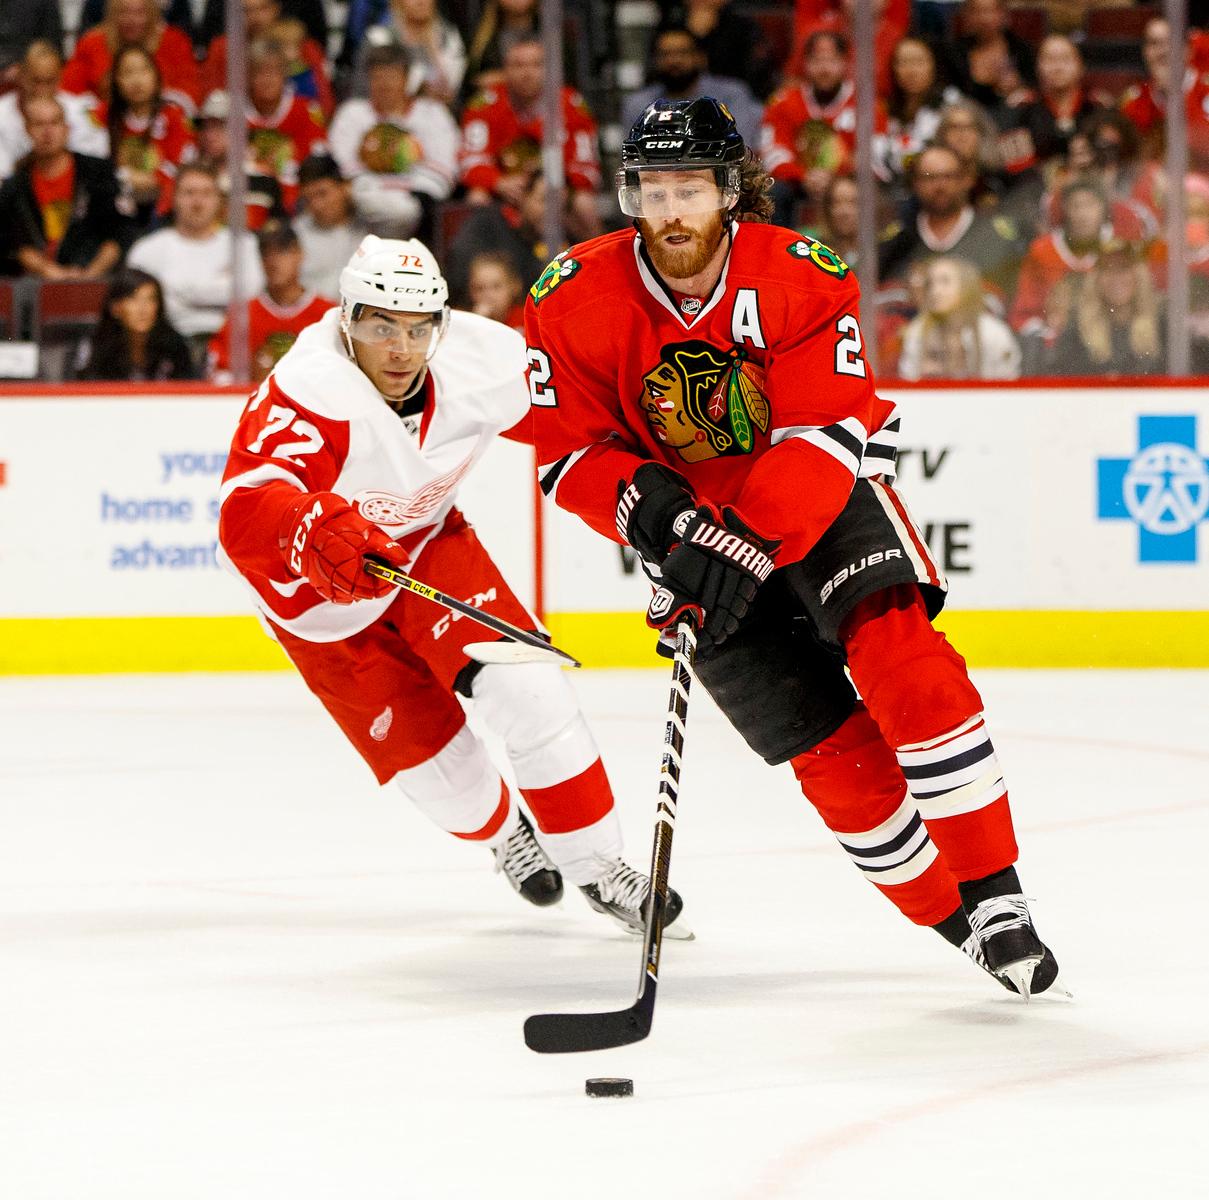 IMAGE: https://photos.smugmug.com/Sports/HockeyPhotos/Blackhawks-vs-RedWings-10-04/i-fTk6RsW/0/X3/CC6Q1624_4551-X2.jpg